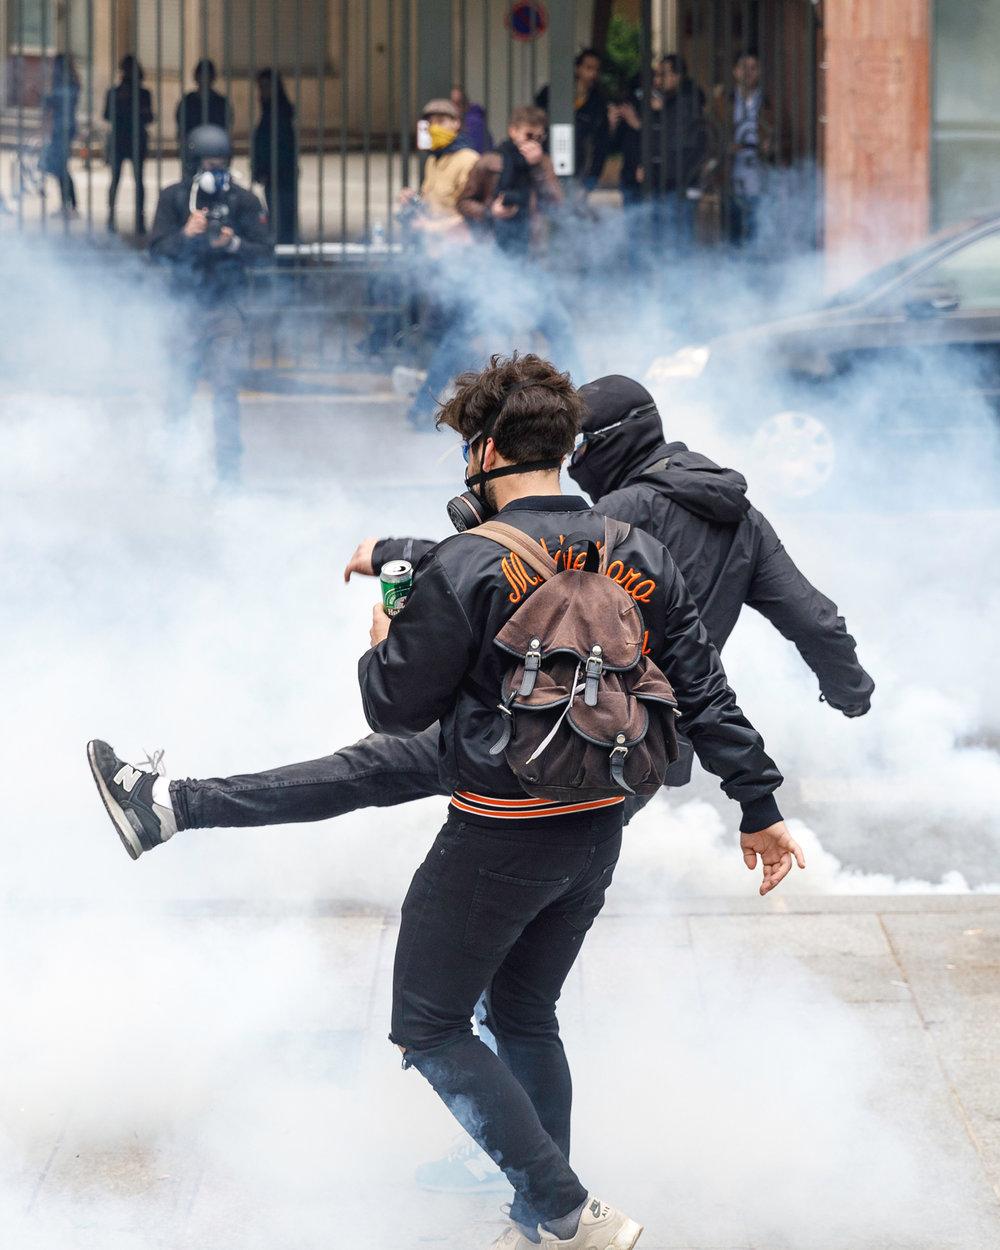 EdRobertson_Occipitals_ParisMayDayRiots_2018_06.jpg